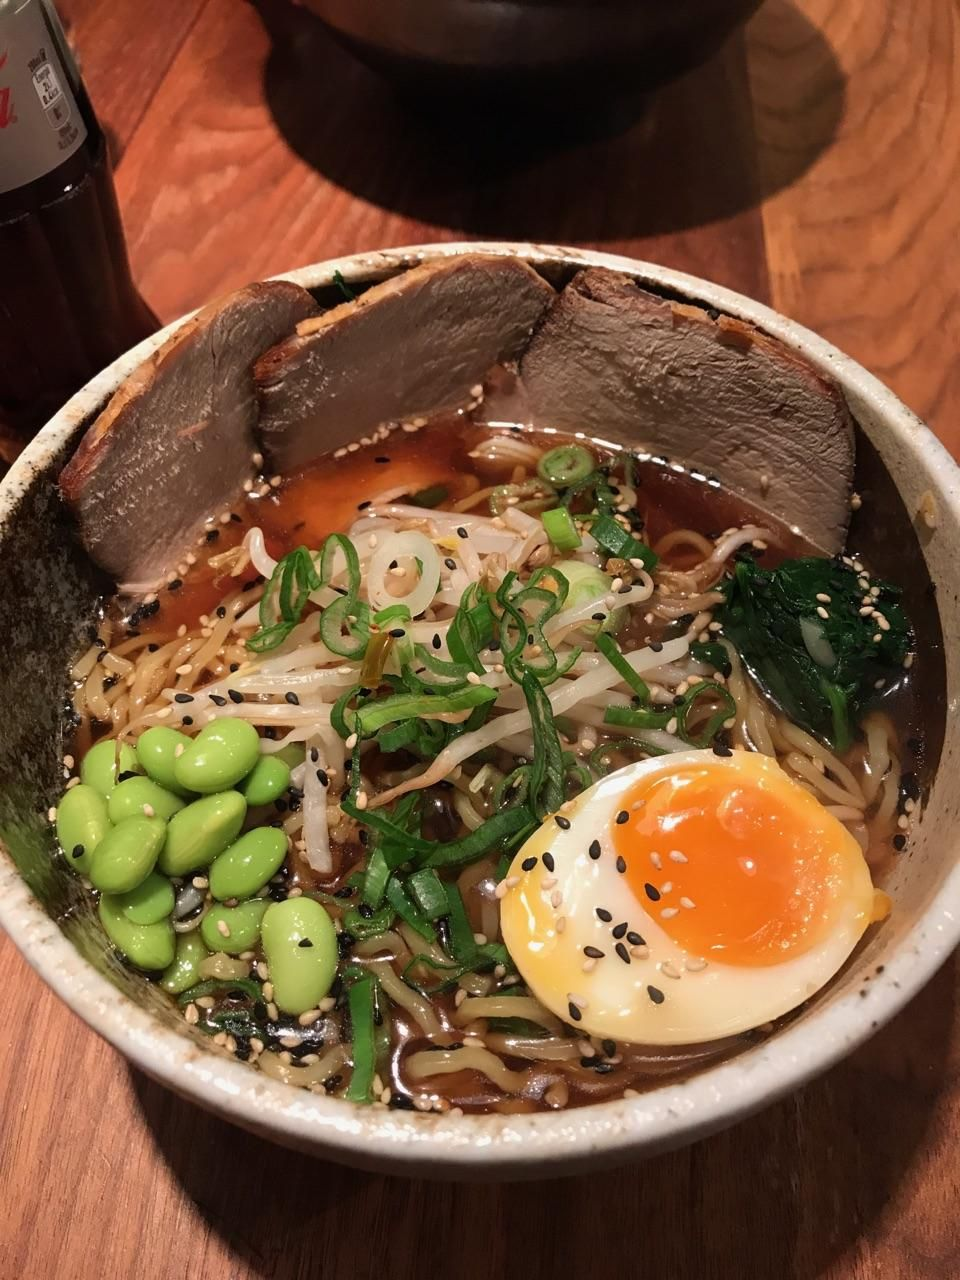 [I ate] Shoyu Ramen! #recipes #food #cooking #delicious #foodie #foodrecipes #cook #recipe #health